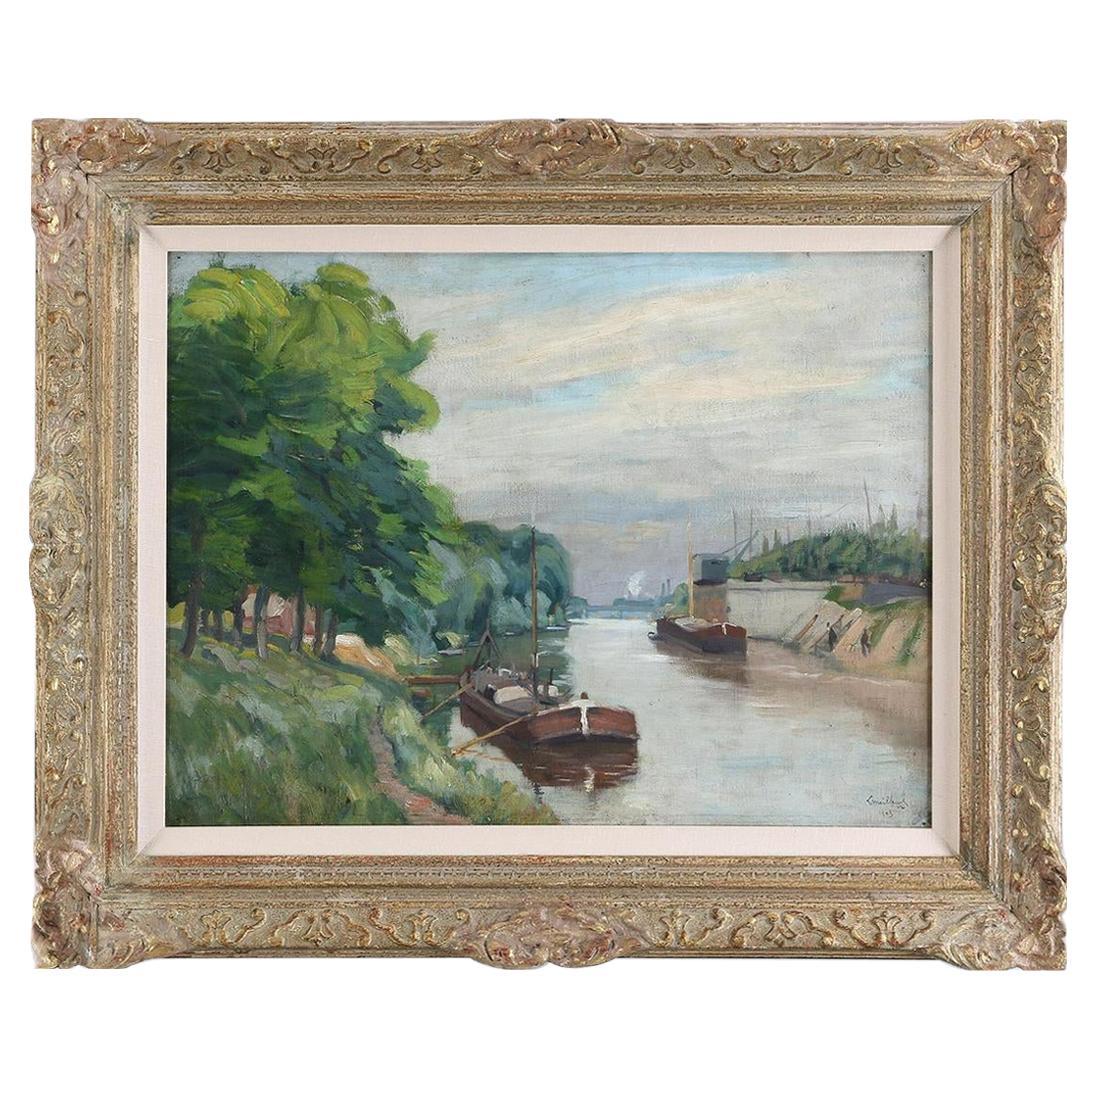 George Le Meilleur French Landscape Oil Painting, Signed 1903